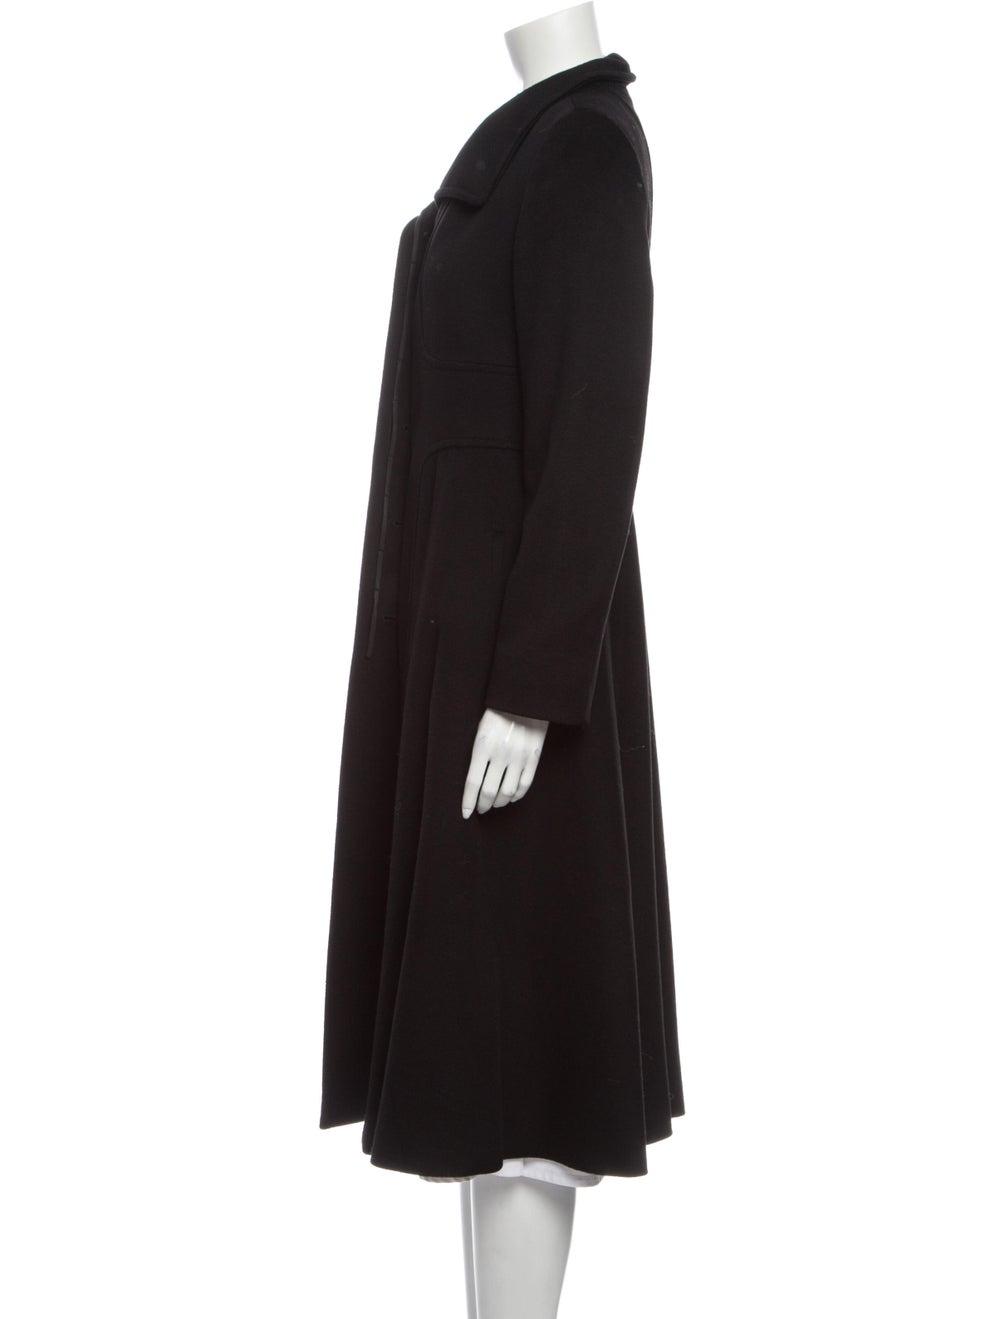 Max Mara Virgin Wool Coat Wool - image 2